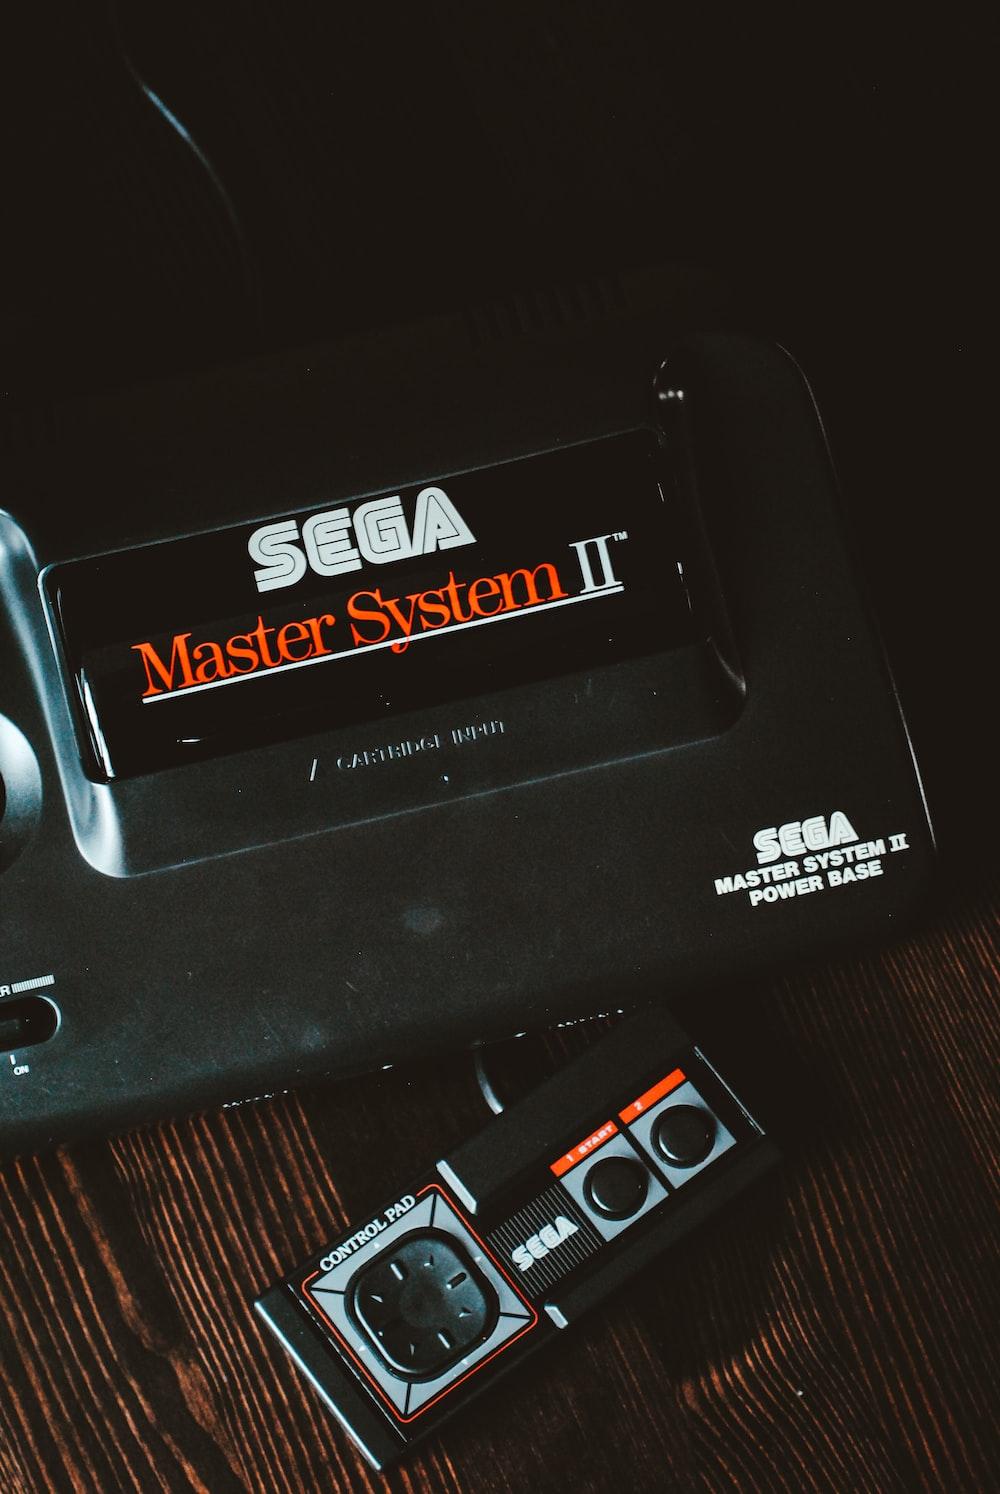 black Sega Master System II device on brown wooden surface